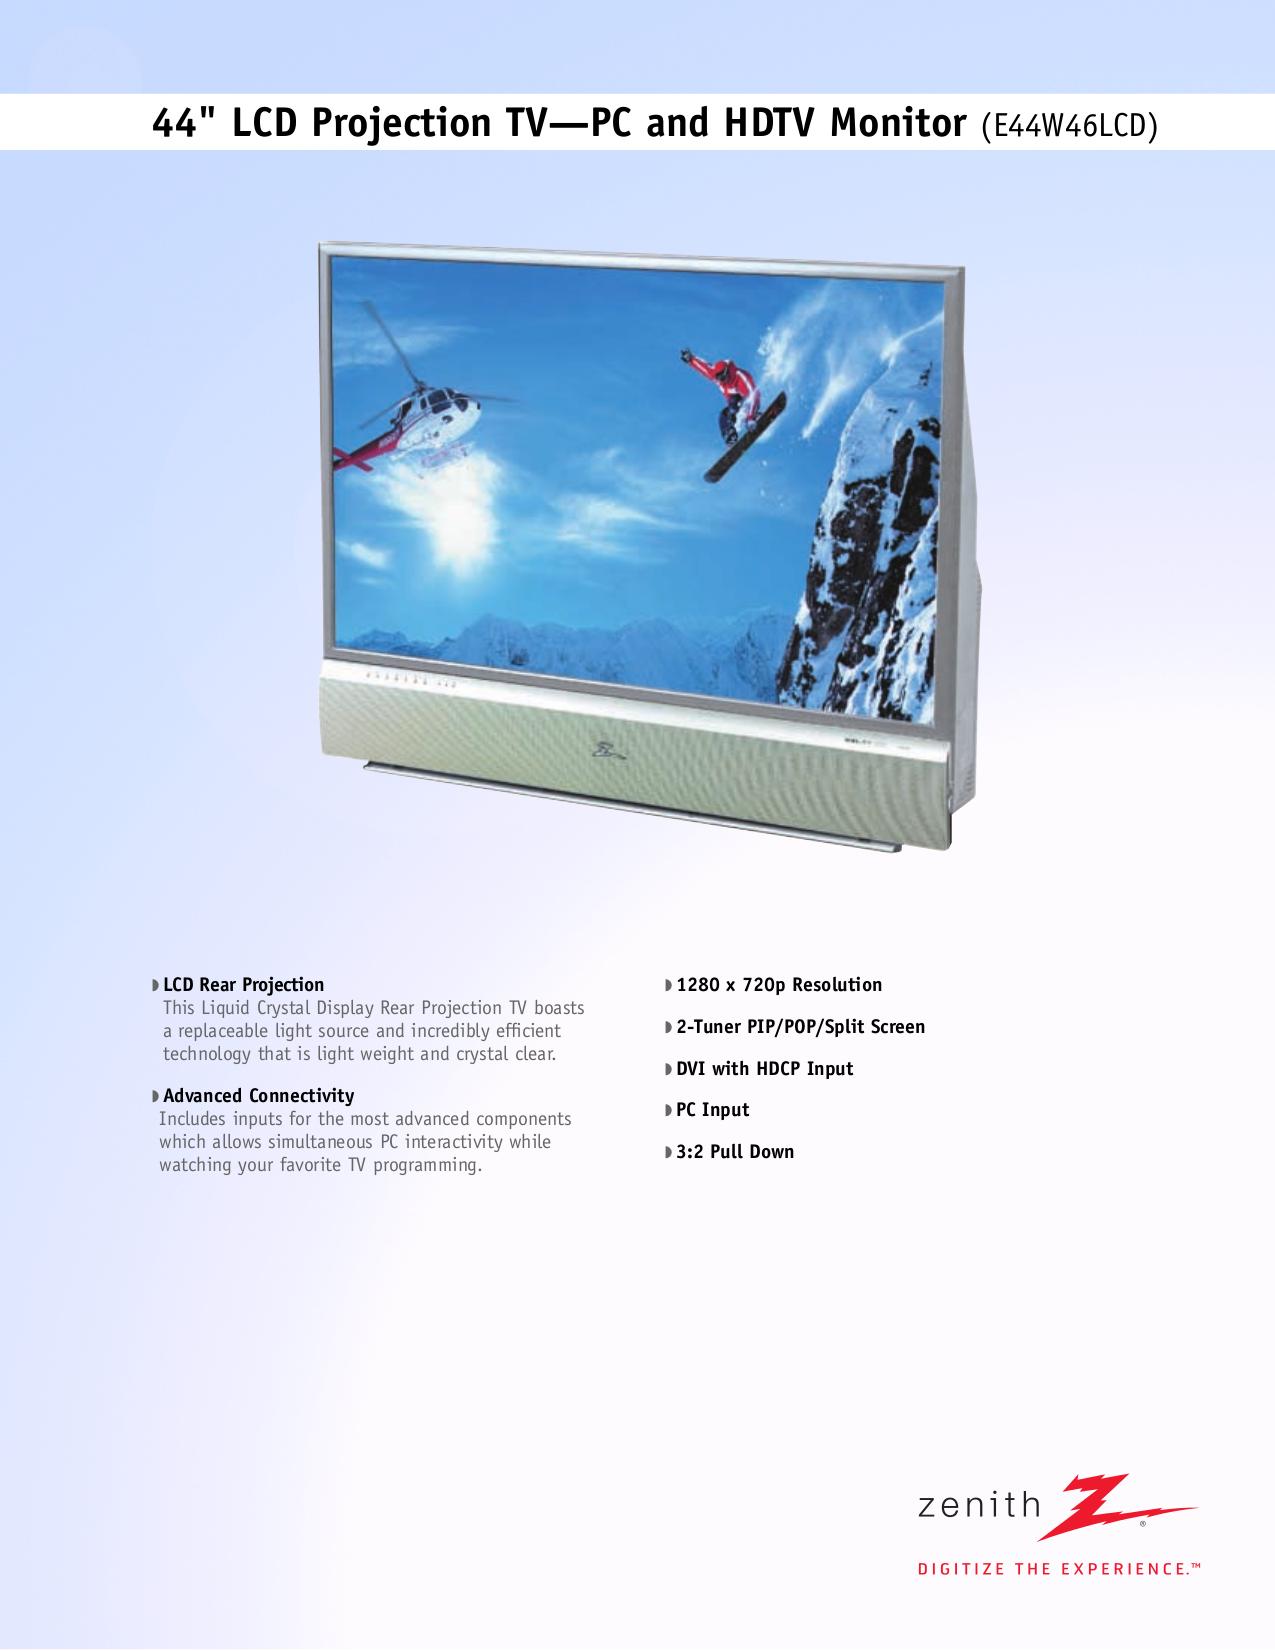 pdf for LG Other KDR-44FS TV Stands manual